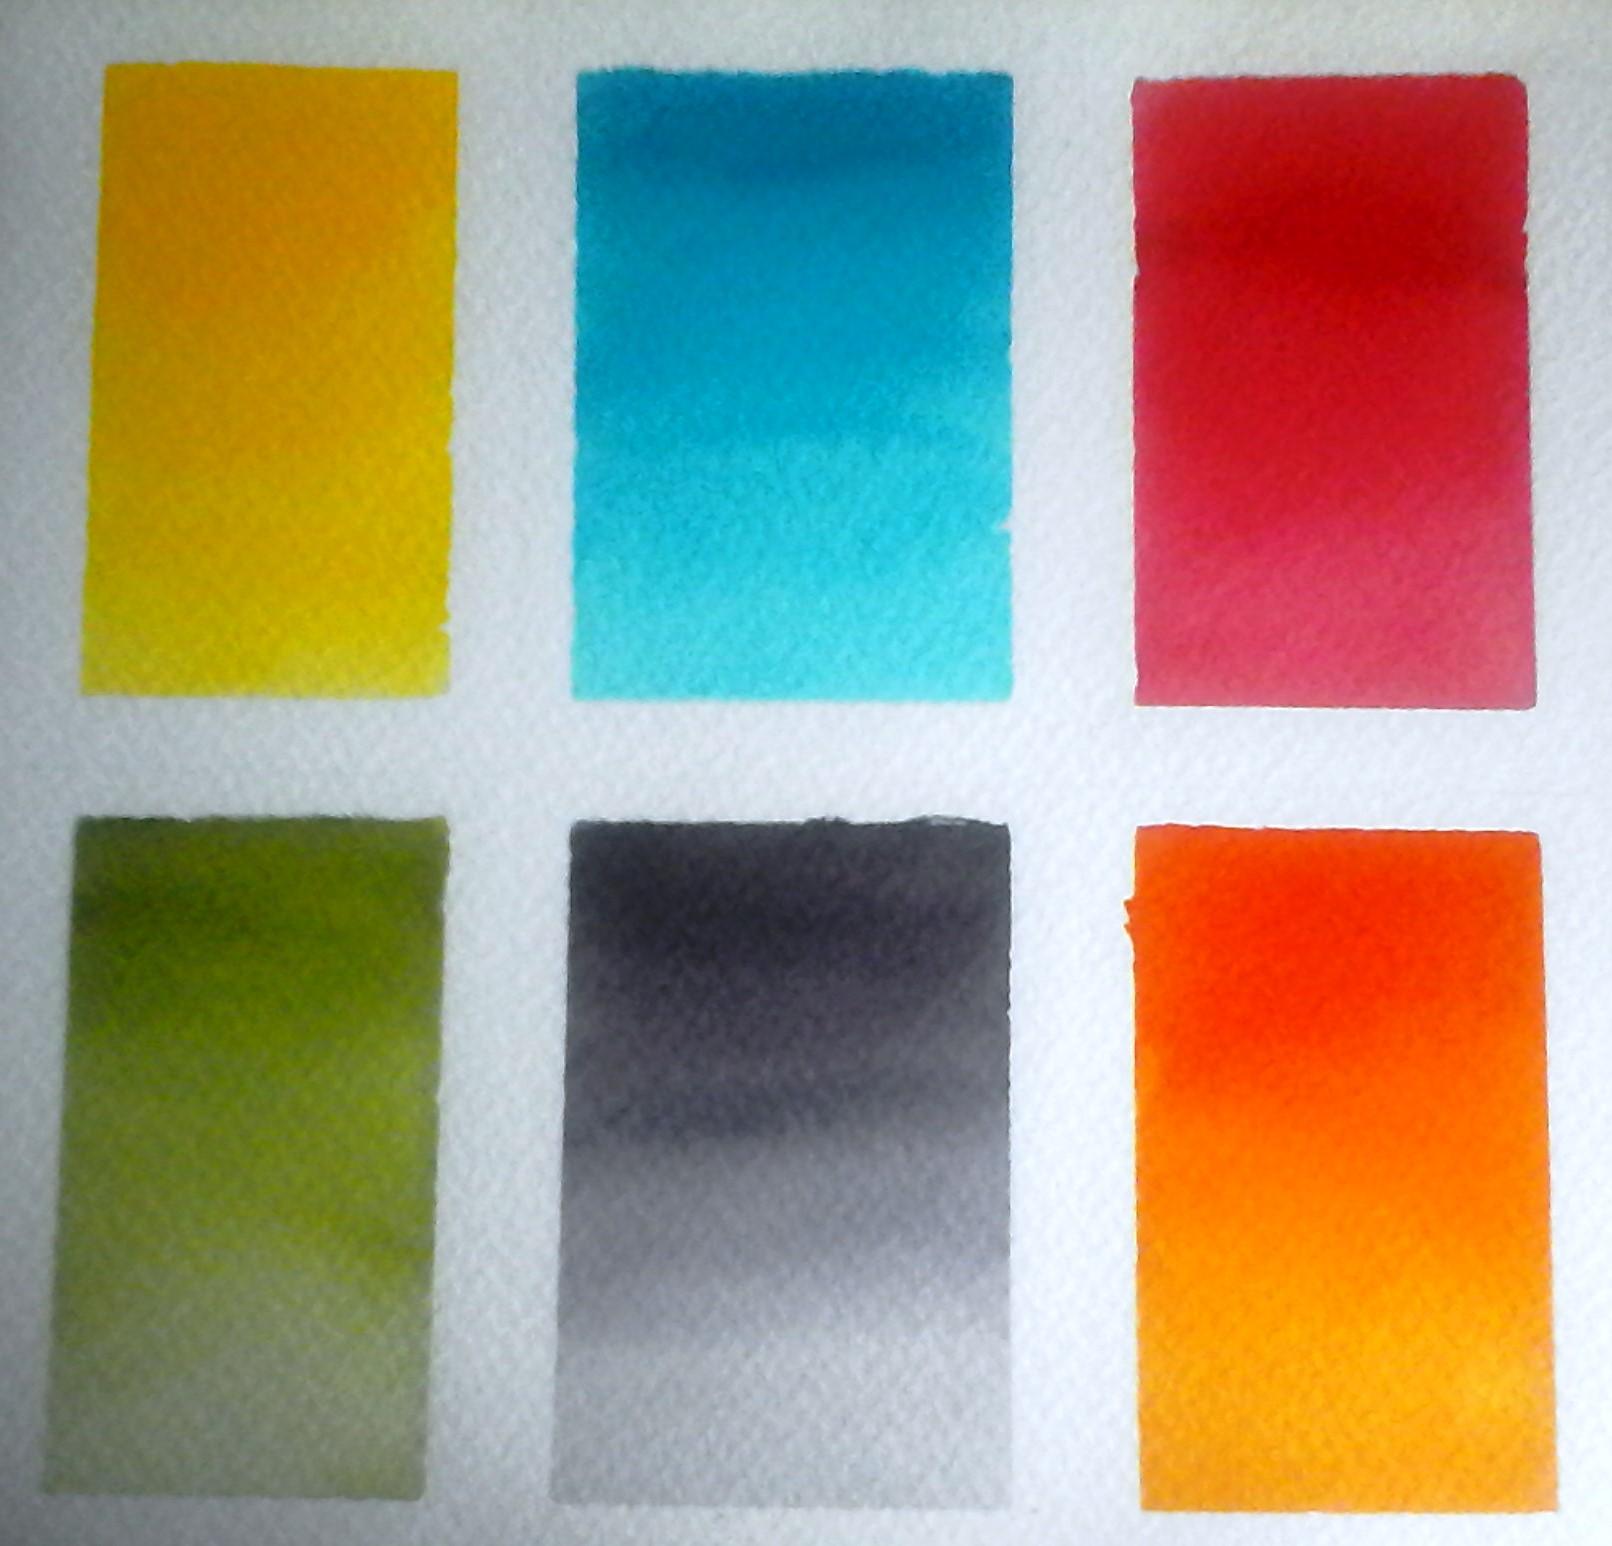 Degradacion de colores en ecolin domestika for De colores de colores